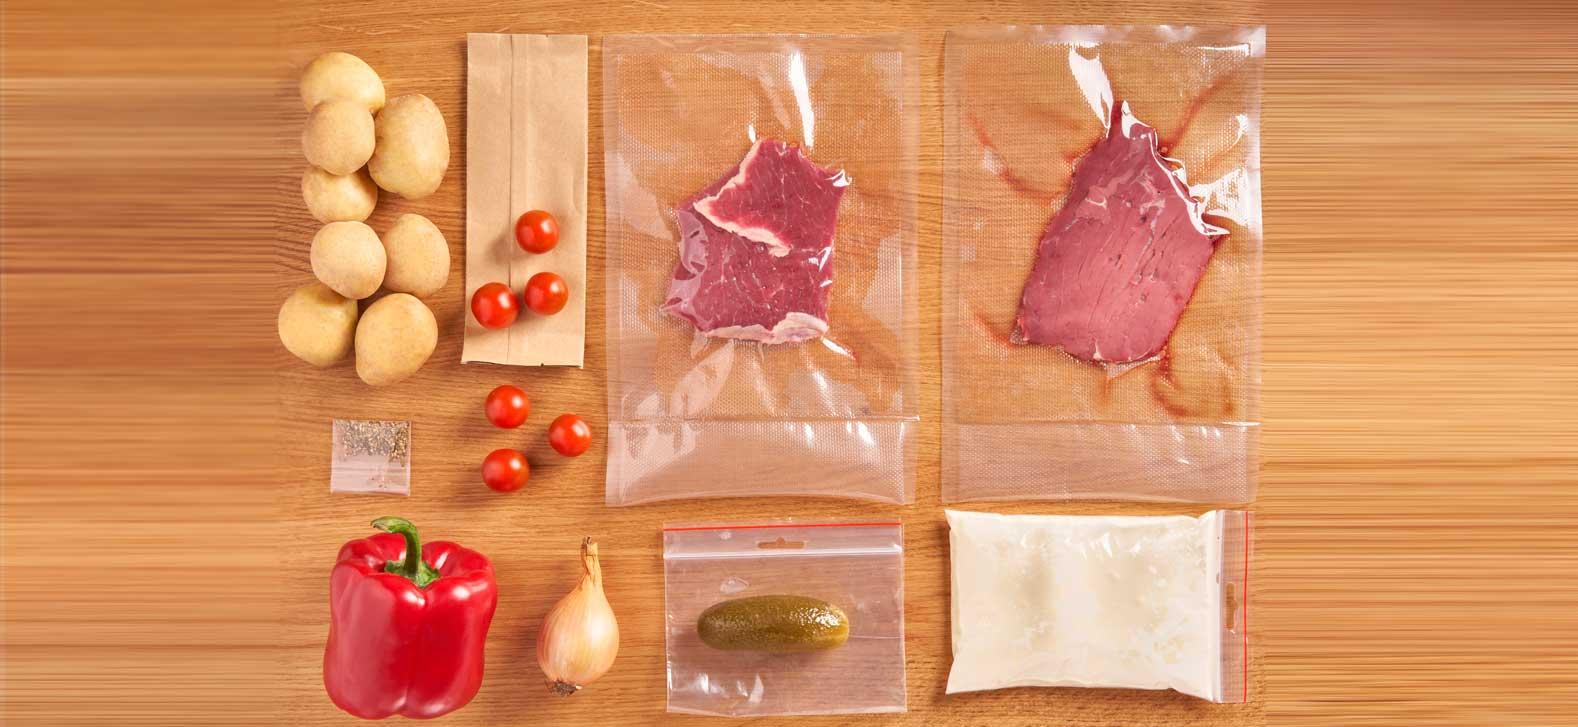 Kits para preparar platillos de restaurantes en casa